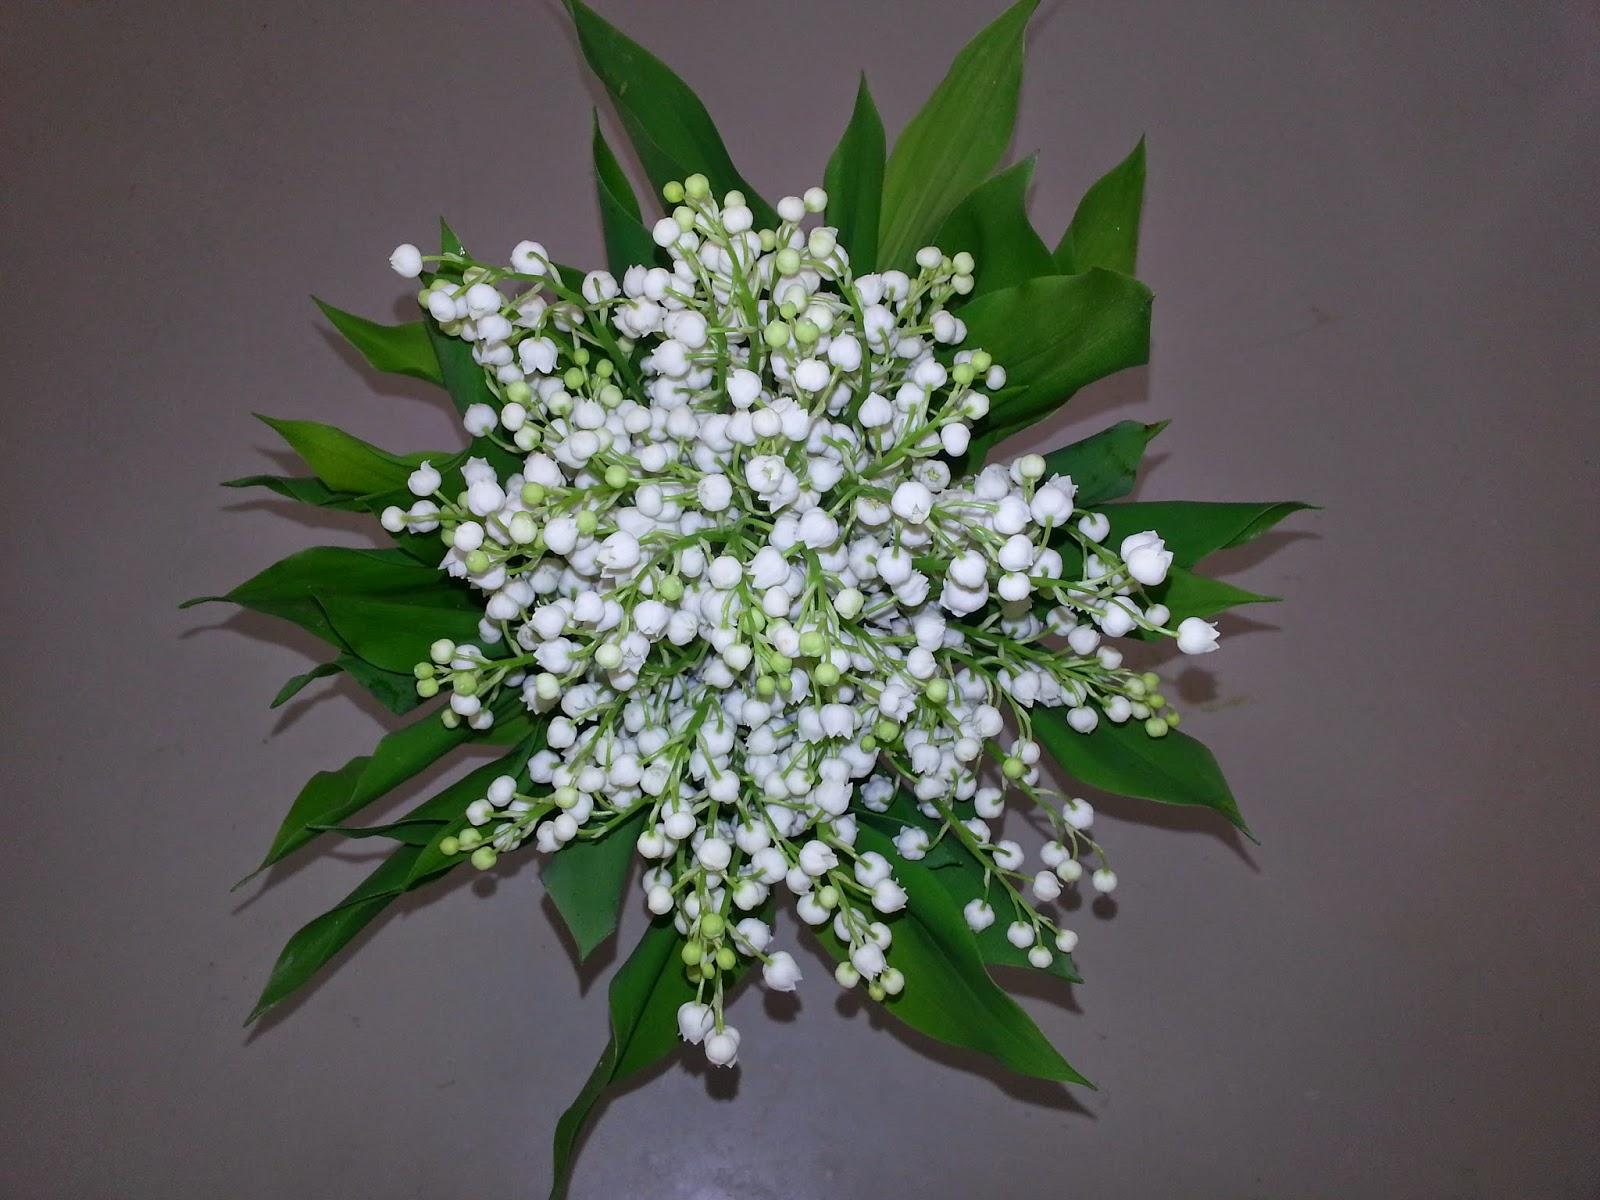 la petite boutique de fleurs fleuriste mariage lyon fleuriste mariage rh ne mai 2014. Black Bedroom Furniture Sets. Home Design Ideas